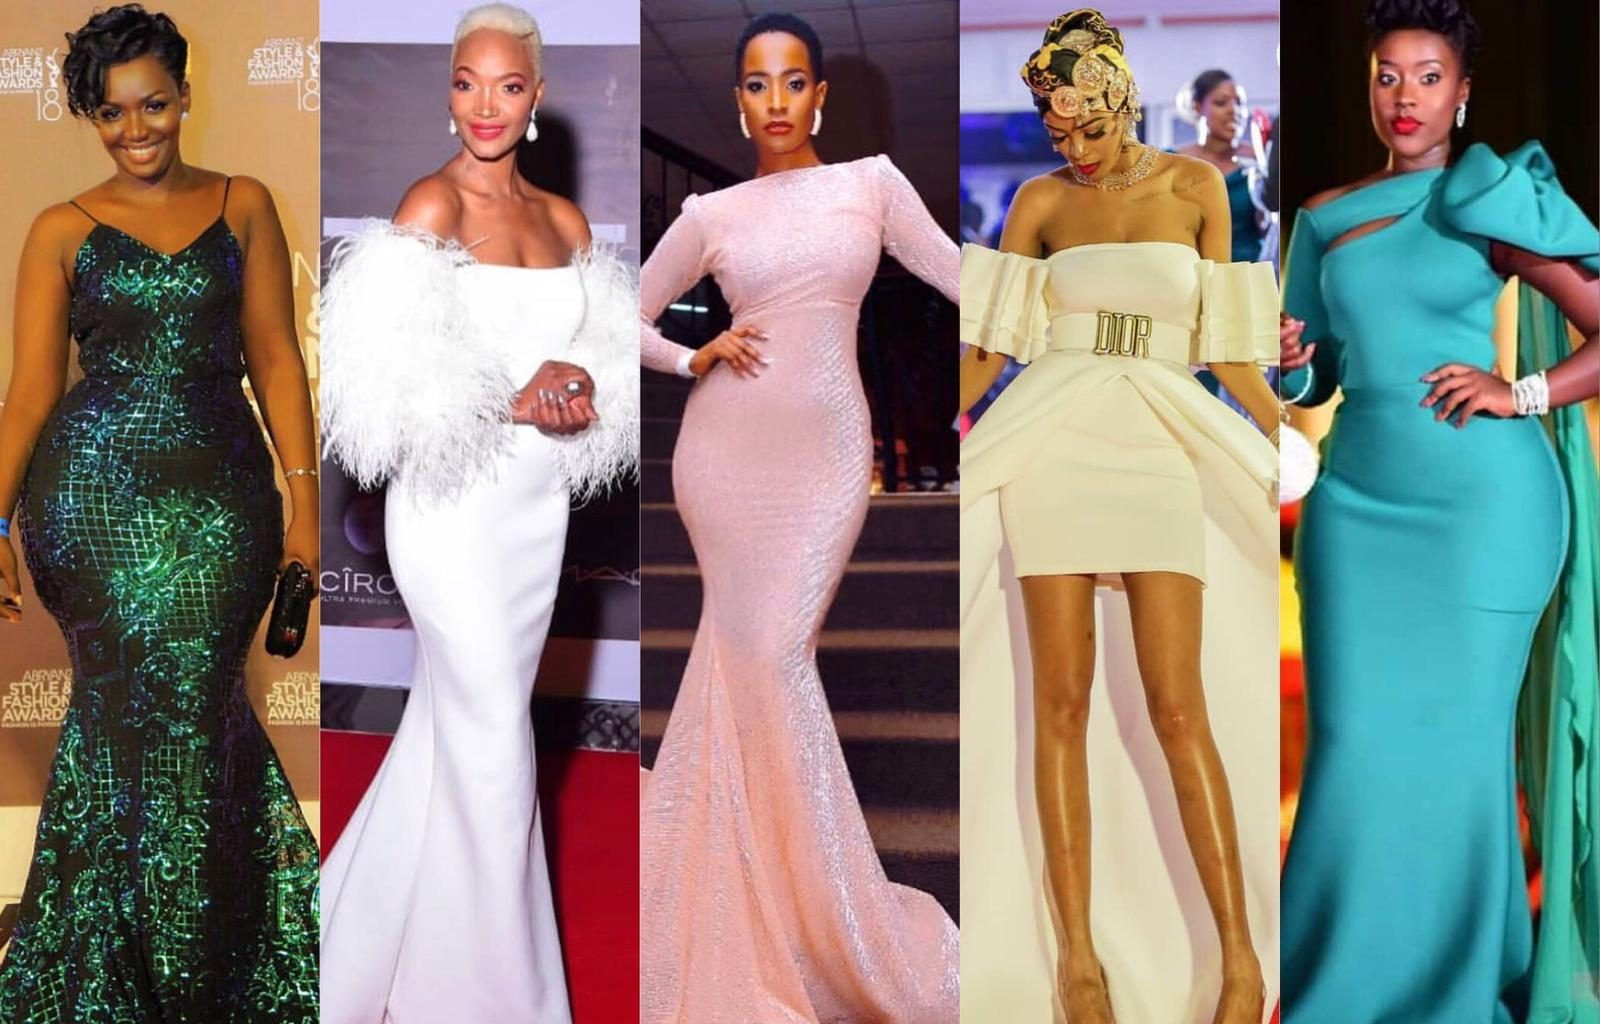 Abryanz Style and Fashion Awards